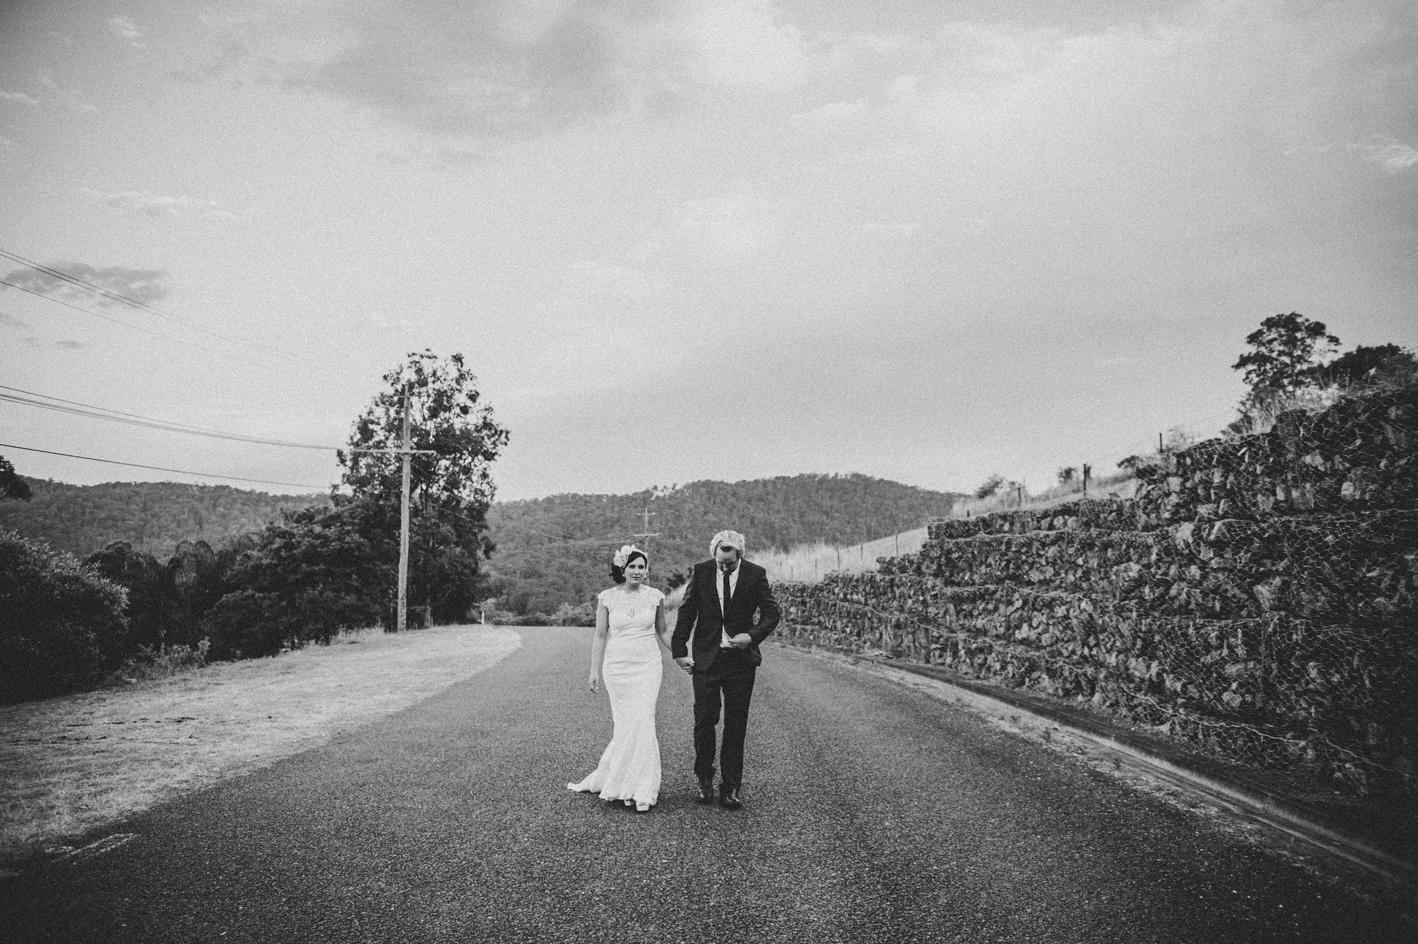 083-hannah-daniel-boomerang-farm-wedding-sophie-baker-photography